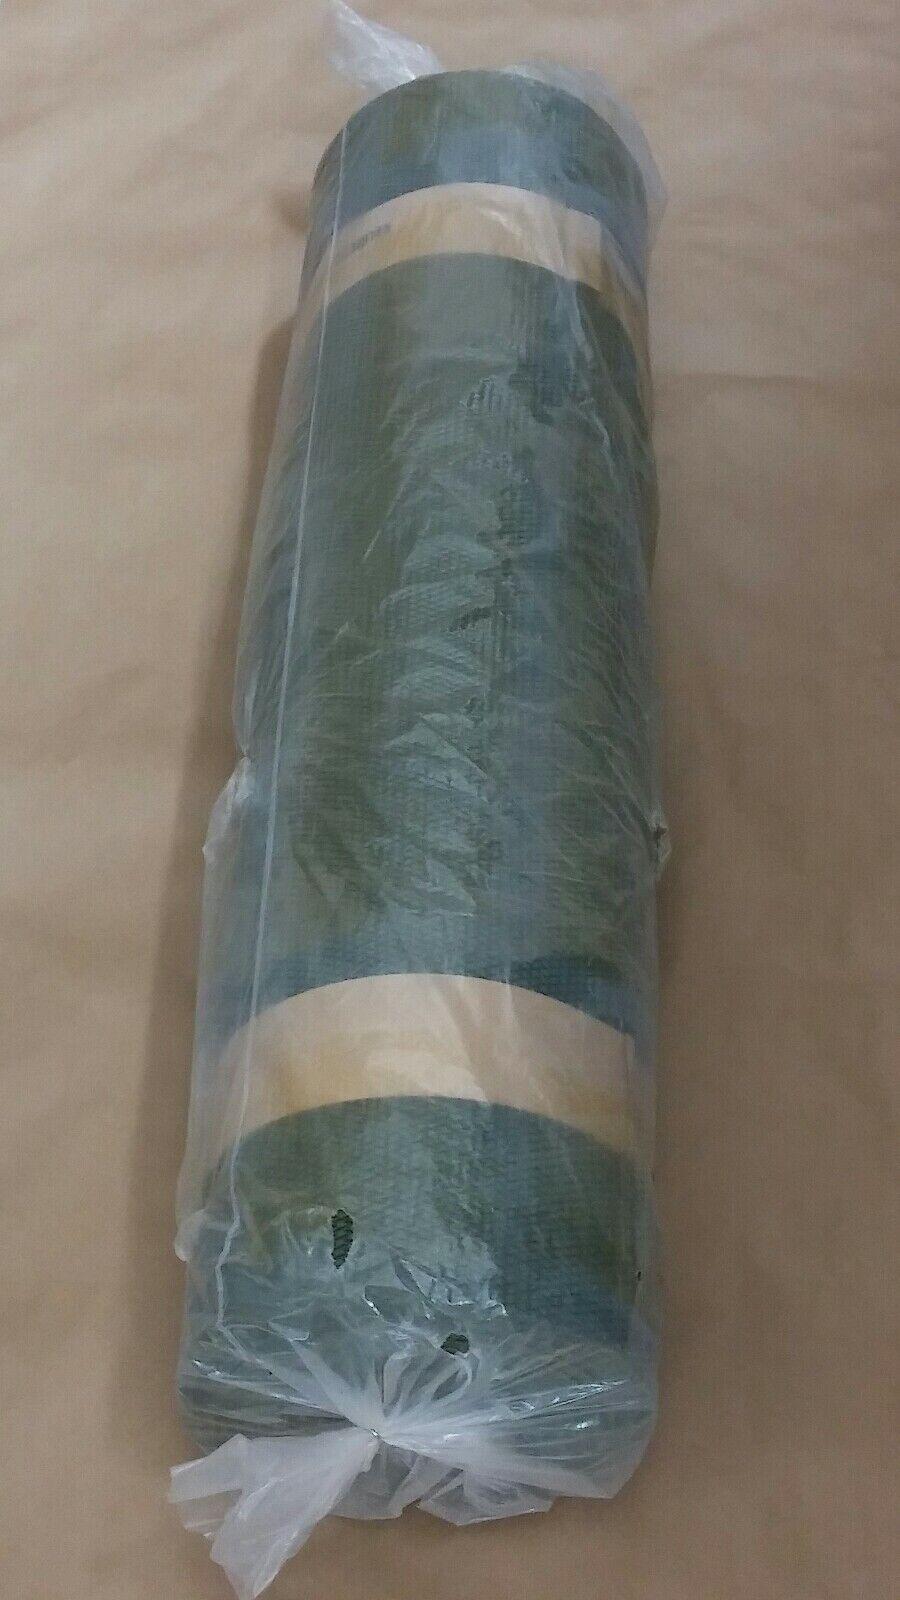 Rug Pad Cushion 54 x30' (15 sy) Full House 110 oz. sy. Read The Description